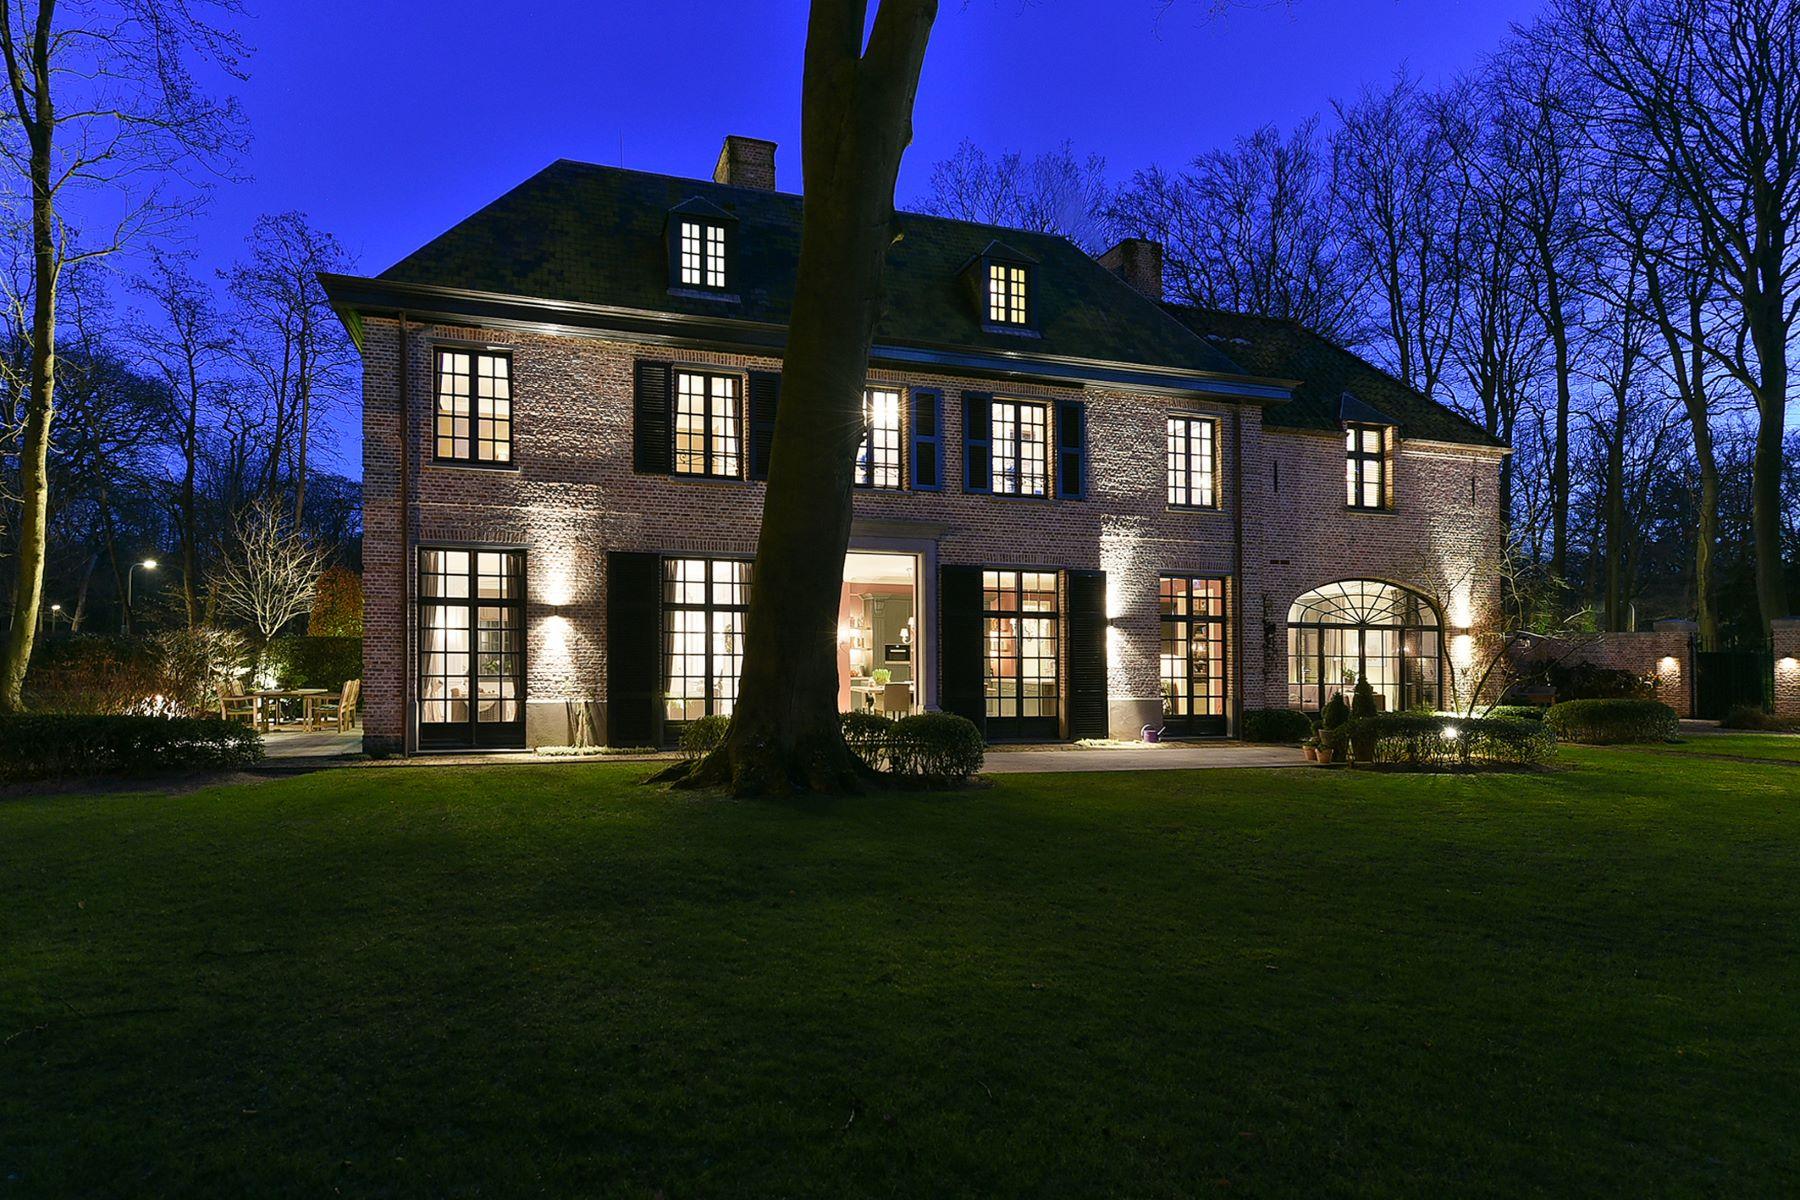 Single Family Homes для того Продажа на Modern Colonial Villa Jagerslaan 13, Jagerslaan ZUID Wassenaar, South Holland 2243 EH Нидерланды